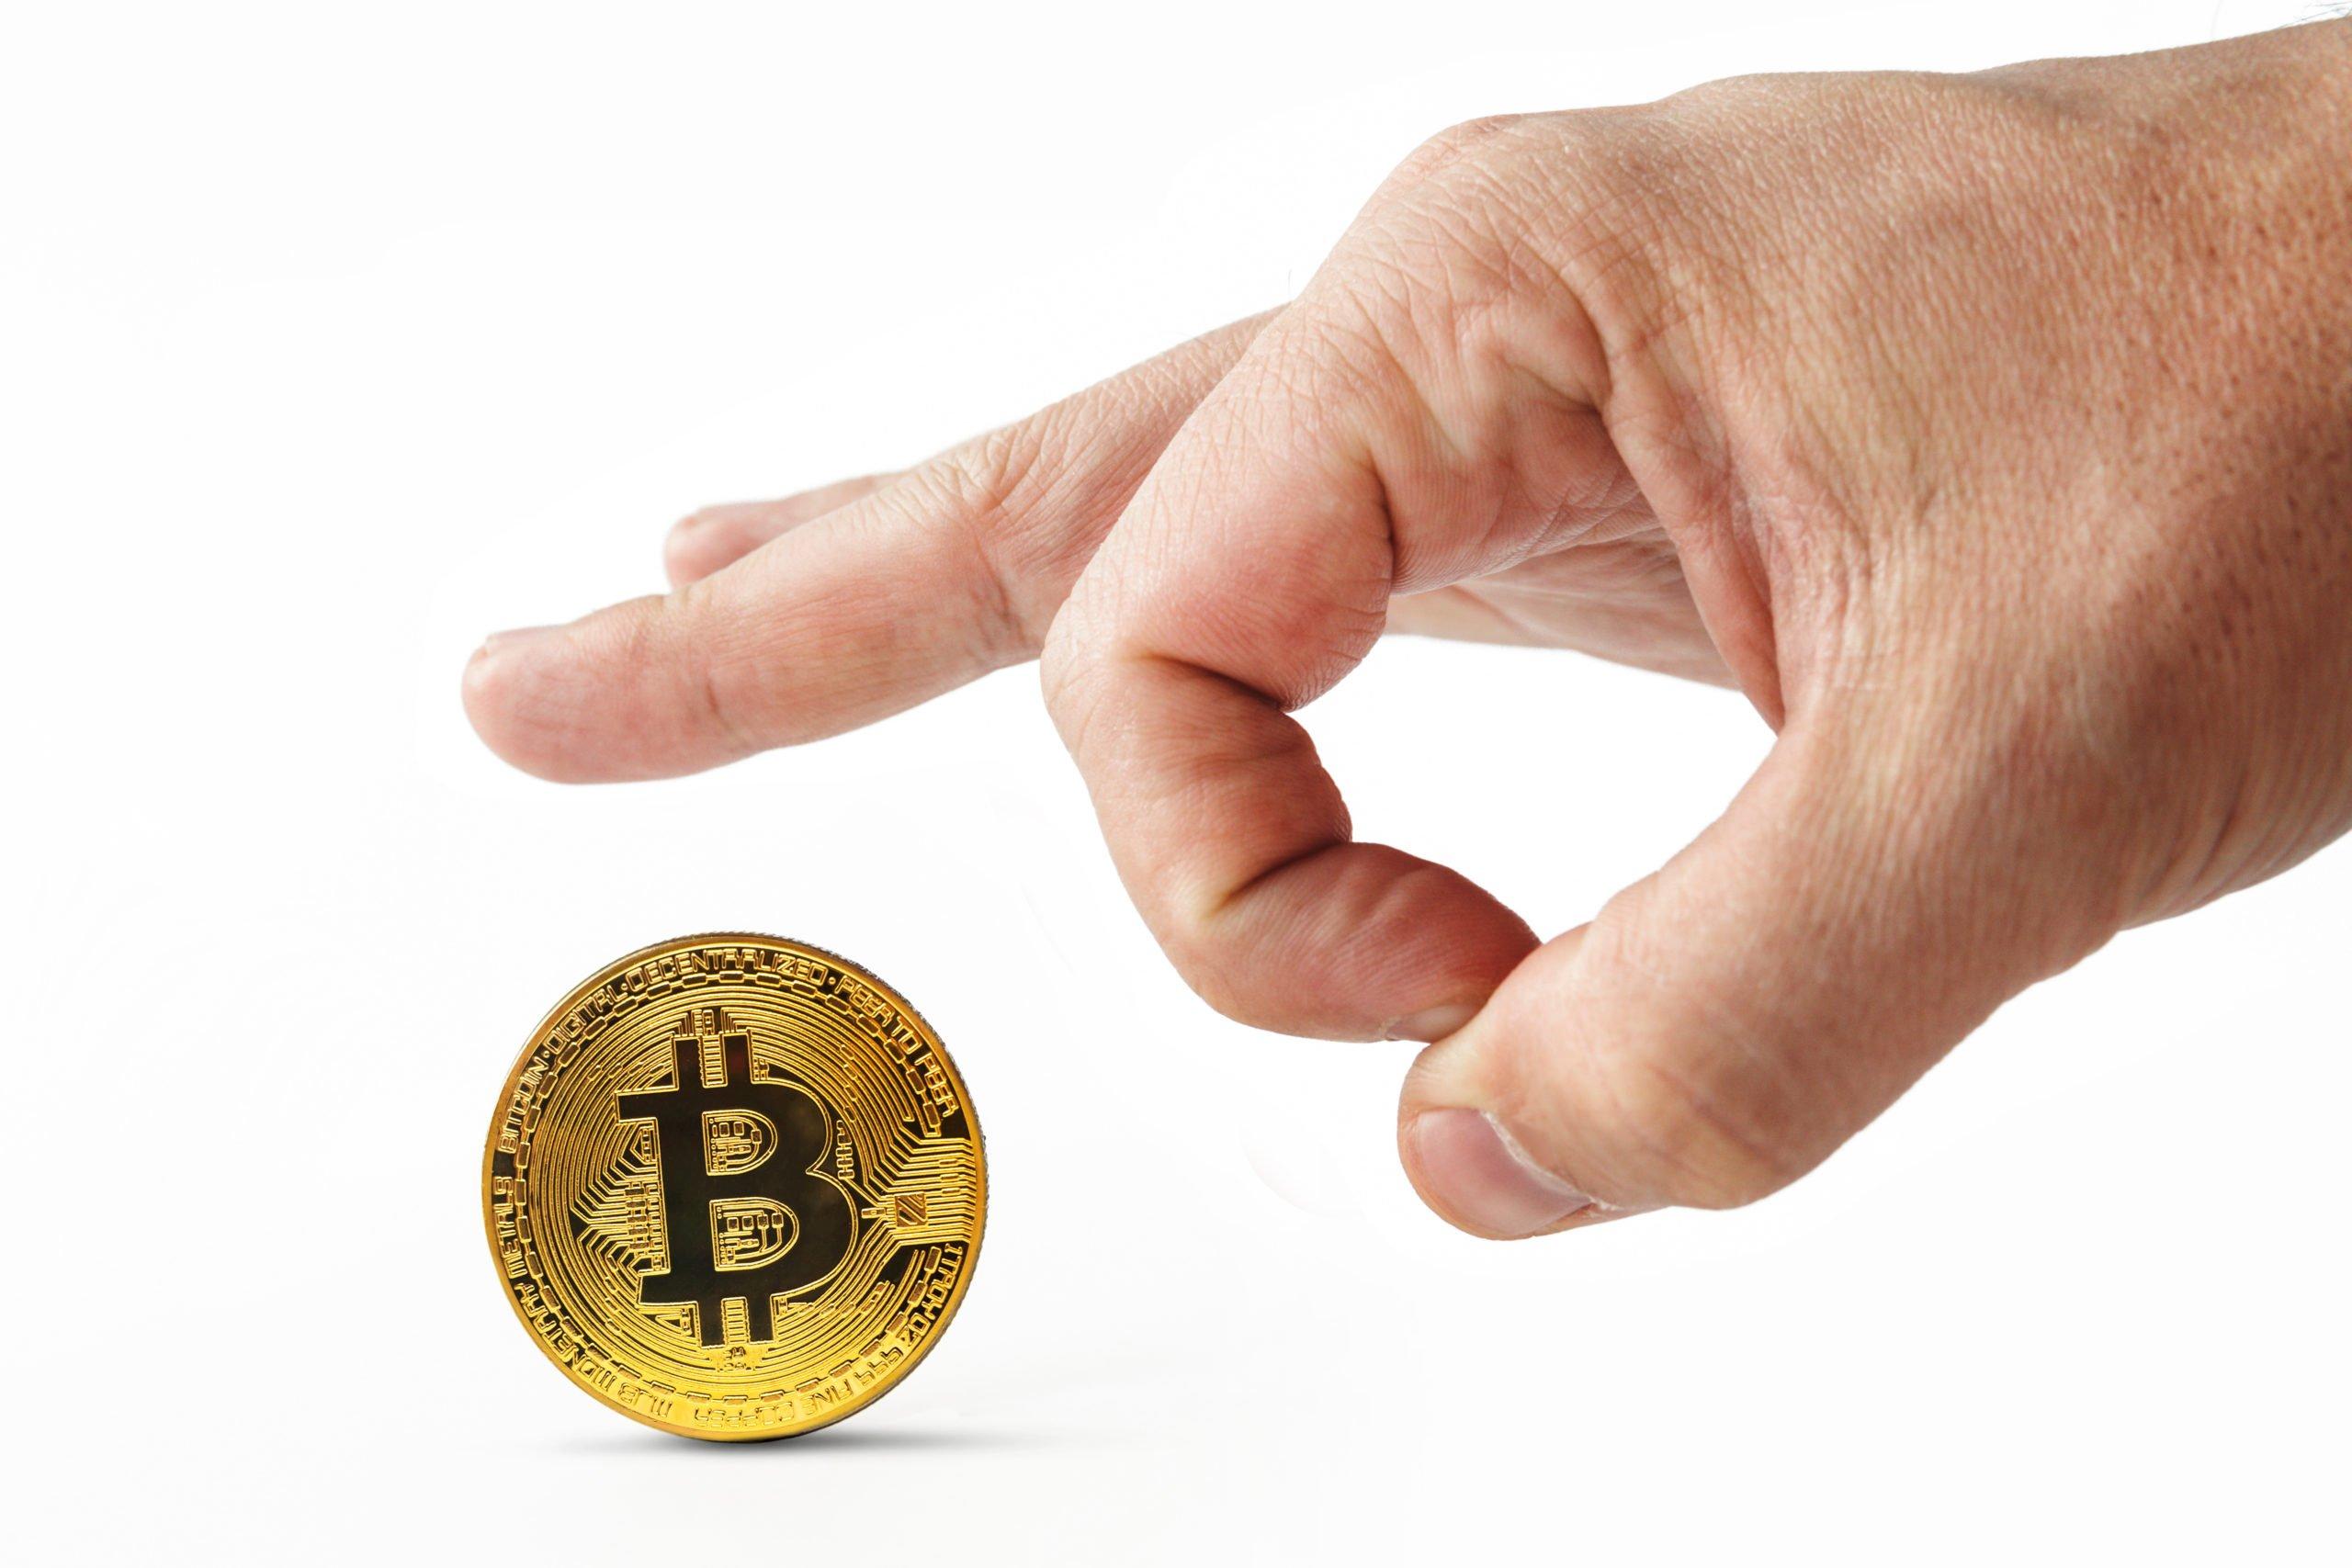 apie btc 2021 bitcoin trader y messi